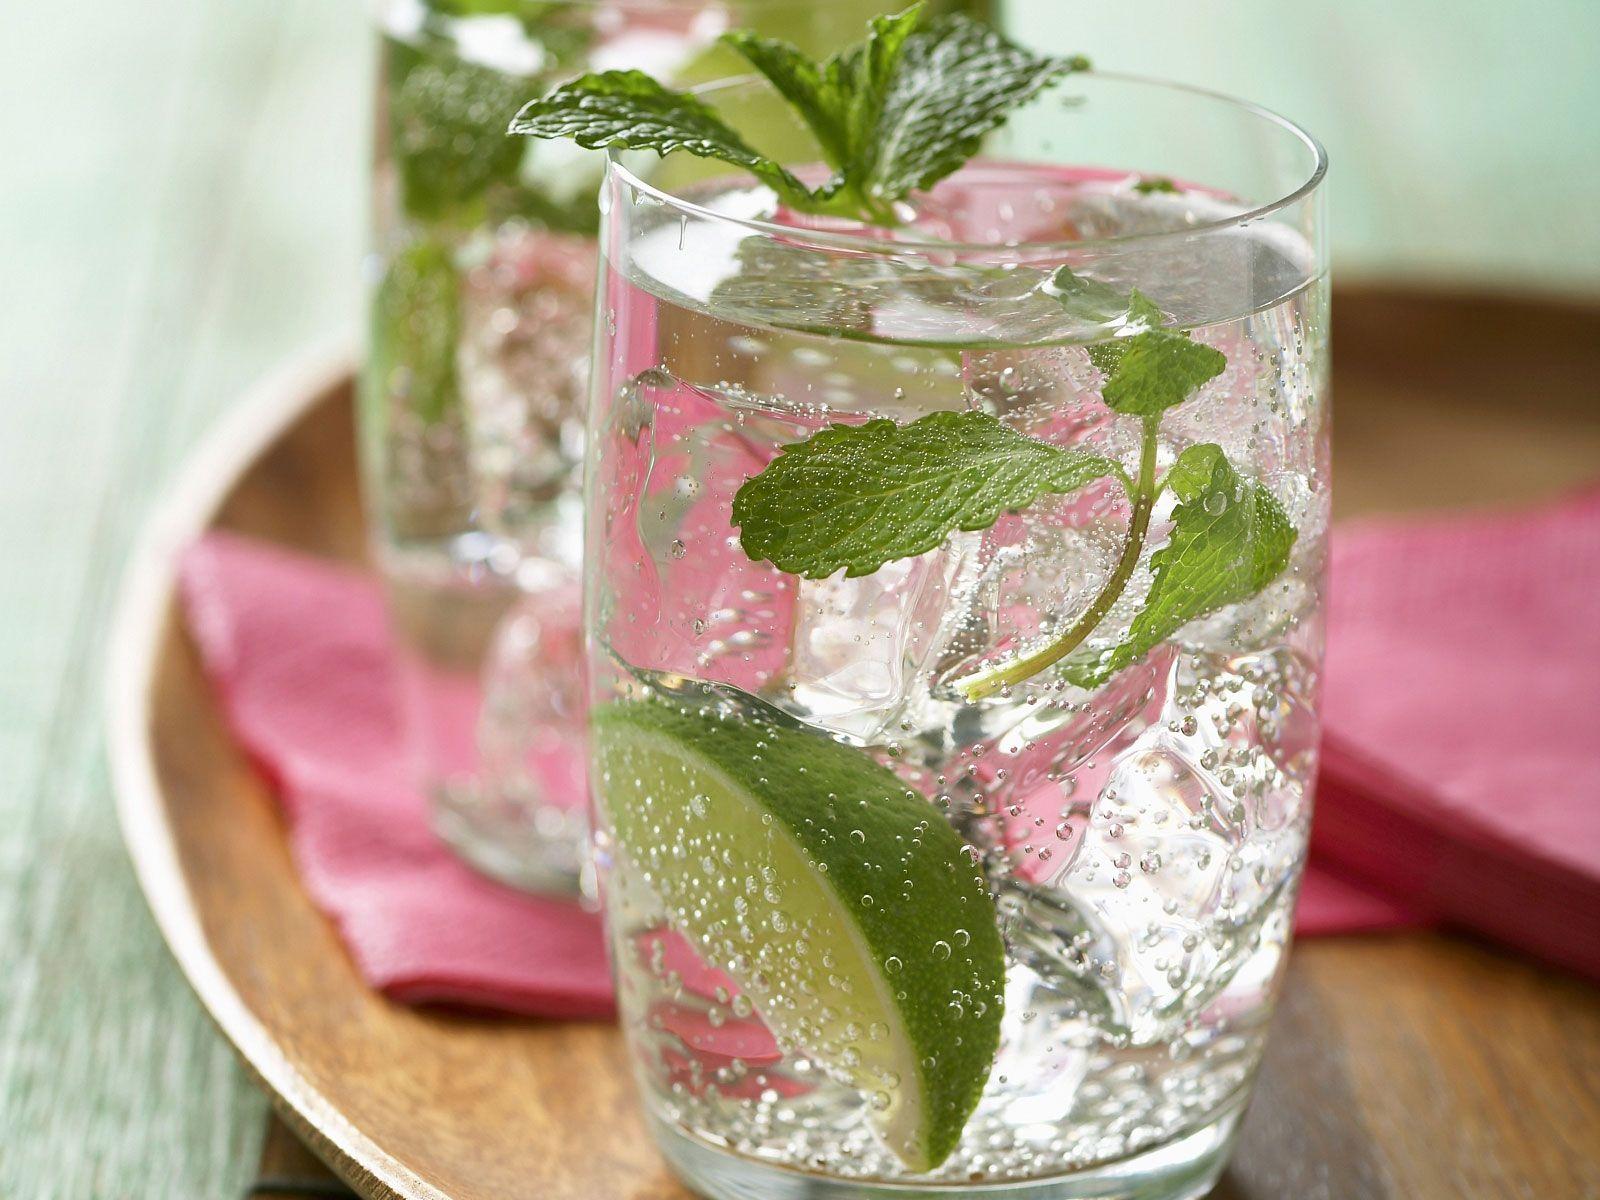 Rum-Cocktail mit Minze (Mojito) Rezept | EAT SMARTER